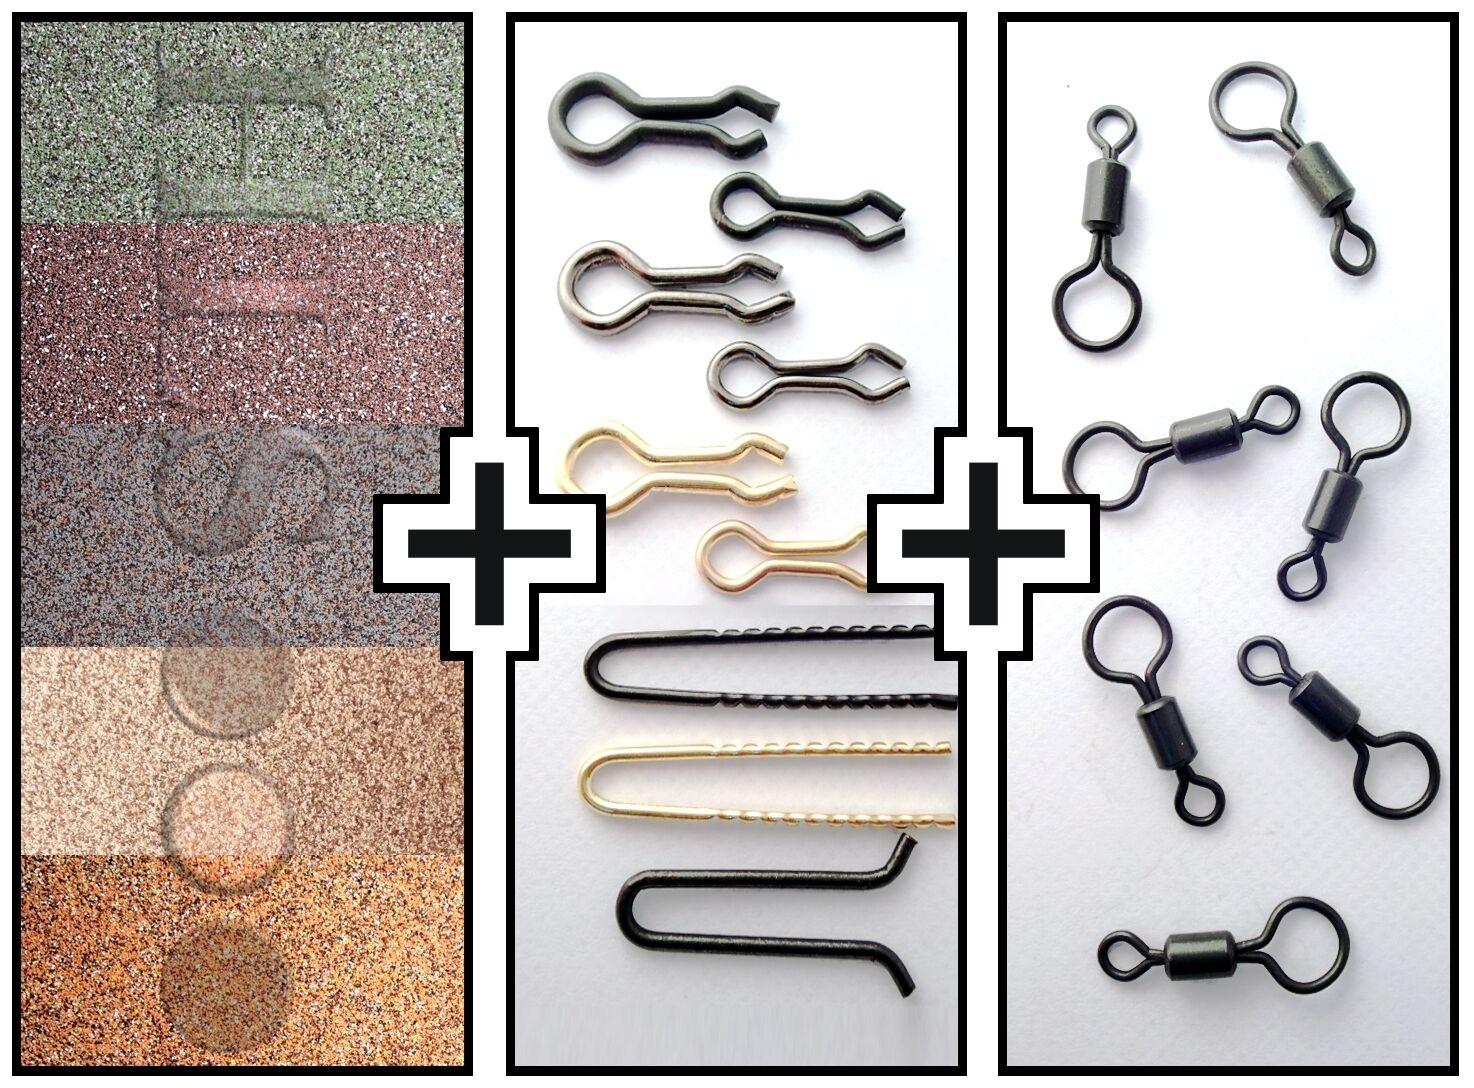 Lead making kit - Lead coating powder + Lead loops + Large eye swivels HLS